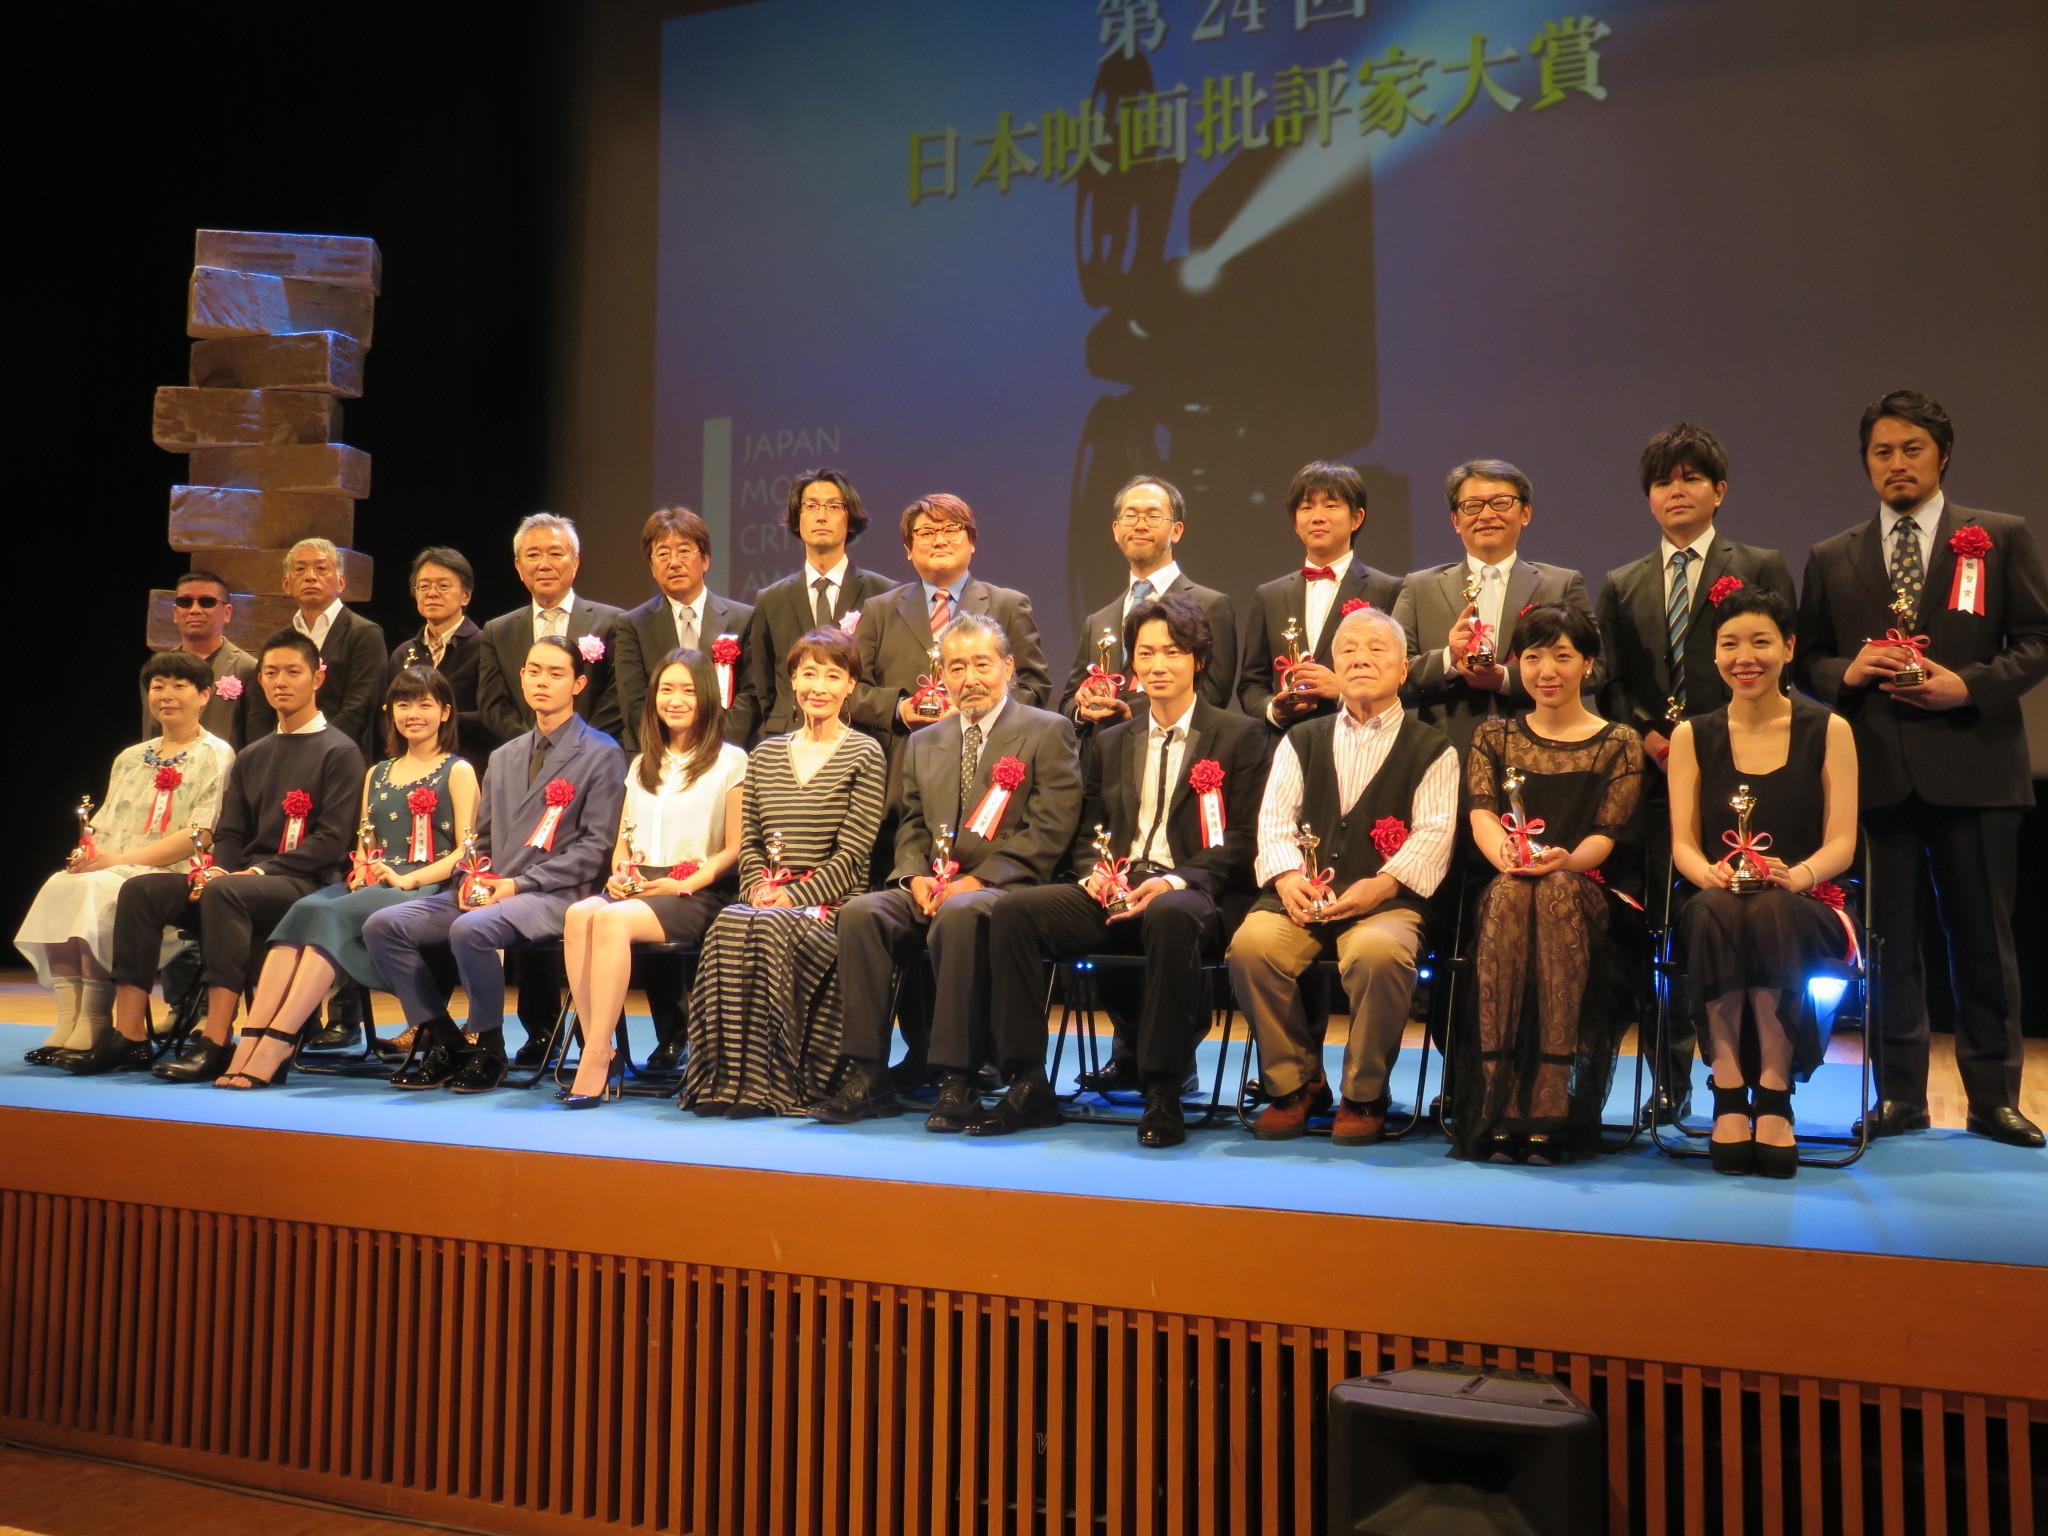 http://news.yoshimoto.co.jp/photos/uncategorized/2015/05/28/20150528213143-116425af9a026c70d16a1e36cd2576028bddb24f.jpg